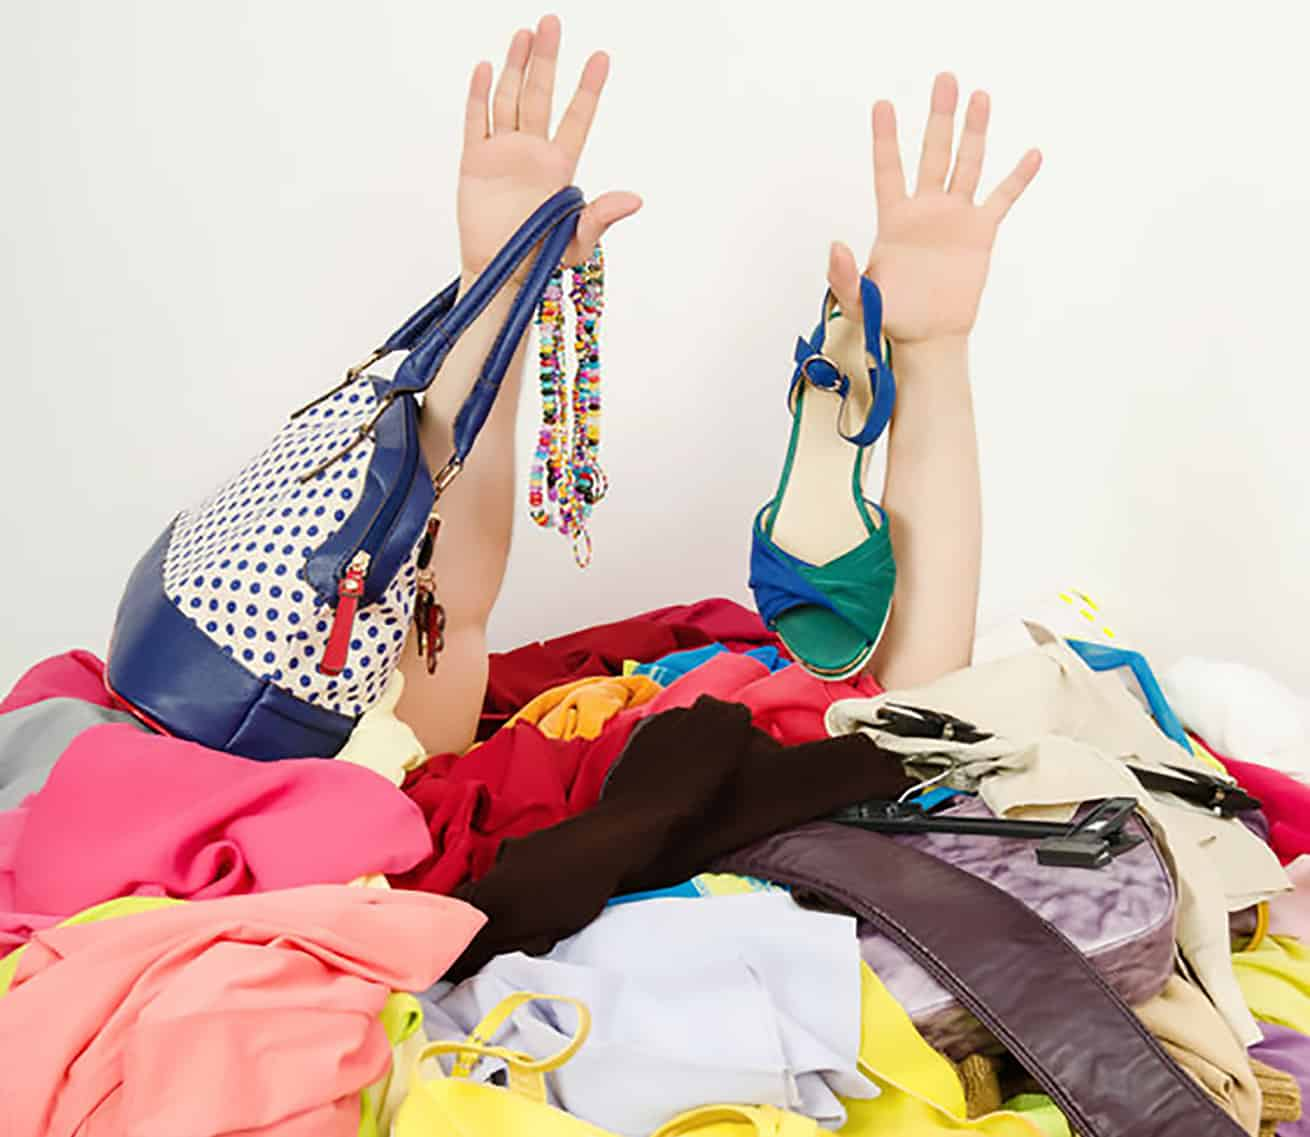 woman buried in closet clutter